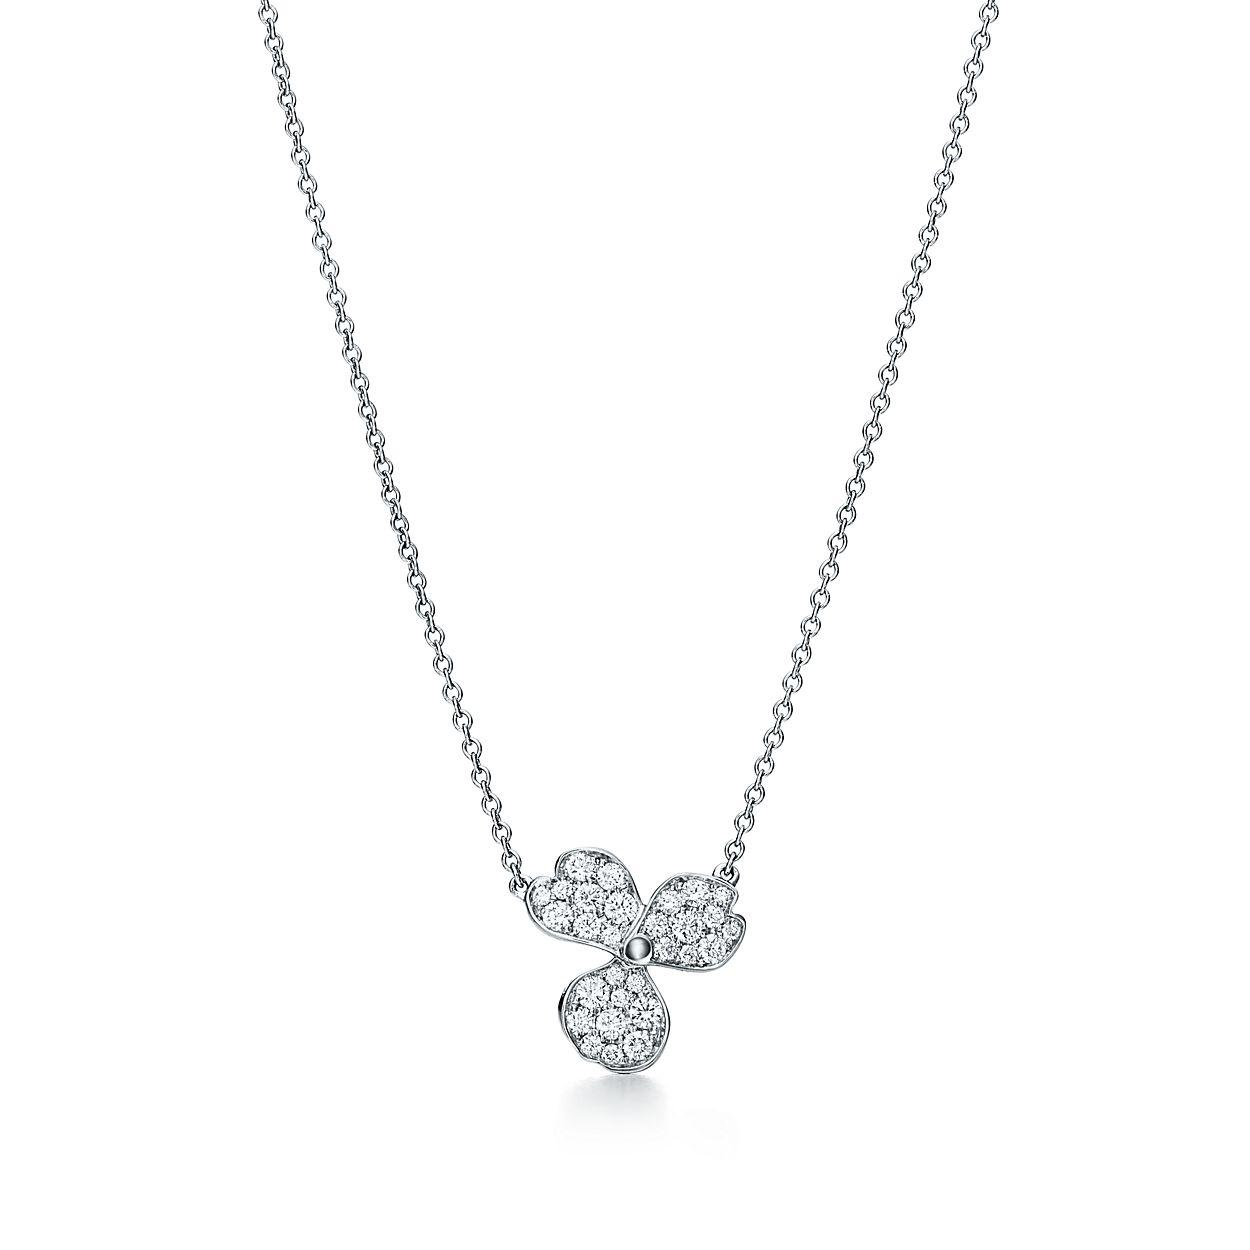 Tiffany paper flowers pav diamond flower pendant in platinum tiffany paper flowerspav diamond flower pendant mightylinksfo